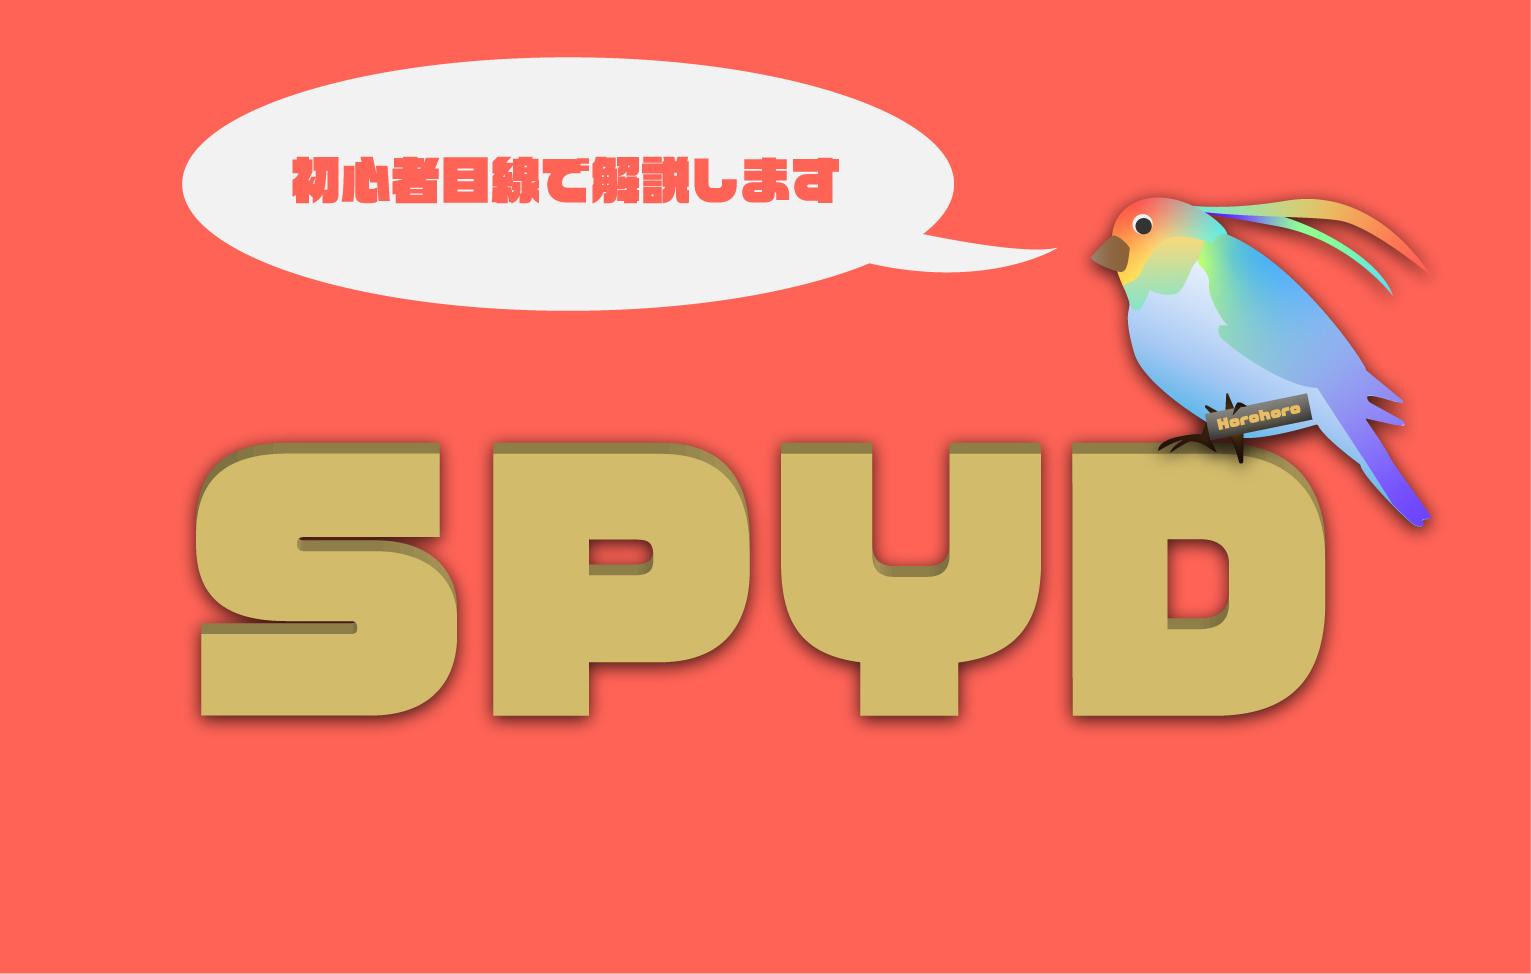 SPYDが高配当銘柄の投資初心者に(ある程度)おすすめな理由